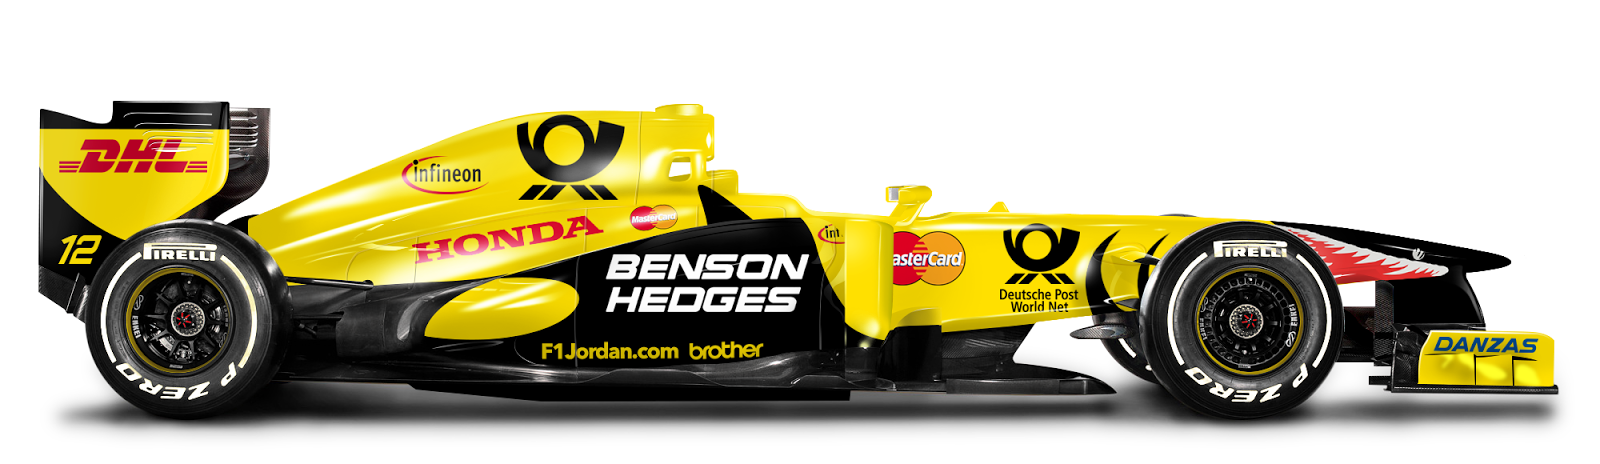 Retro F1 Car Jordan 2001 De Bastiani Design